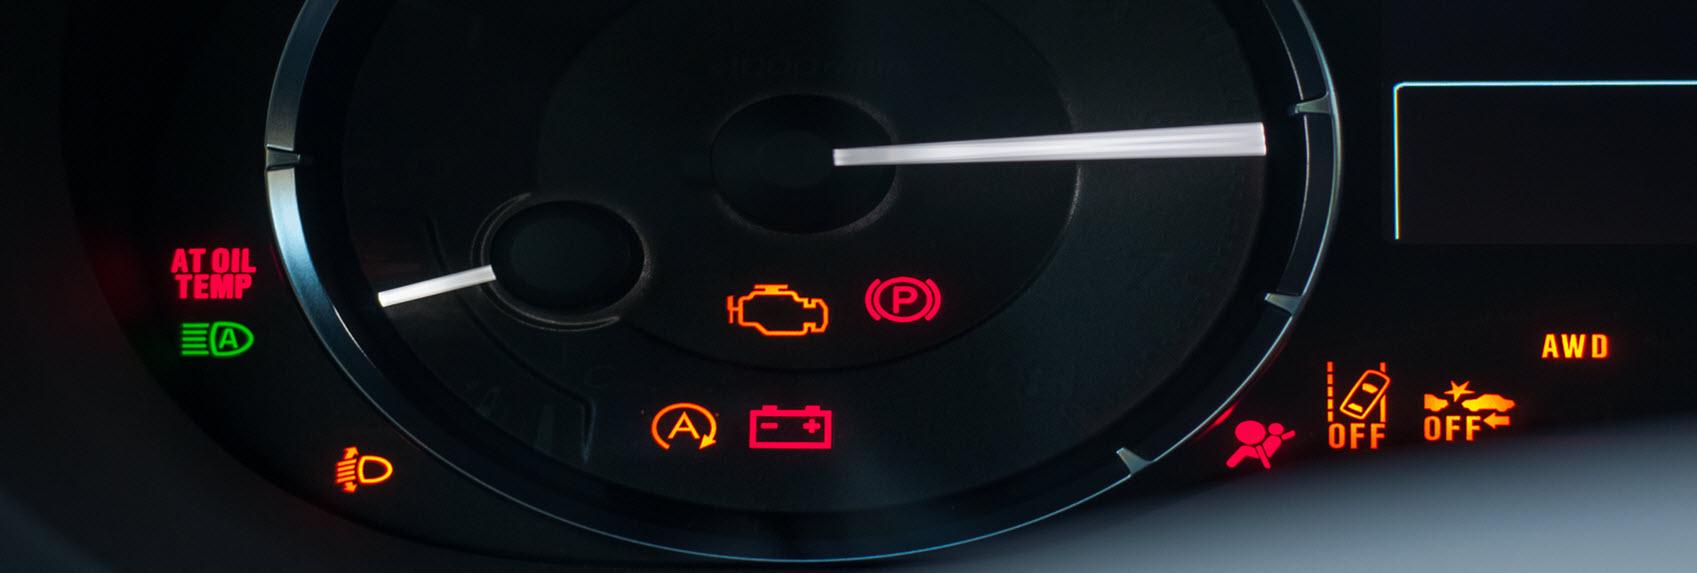 warning lights on a car